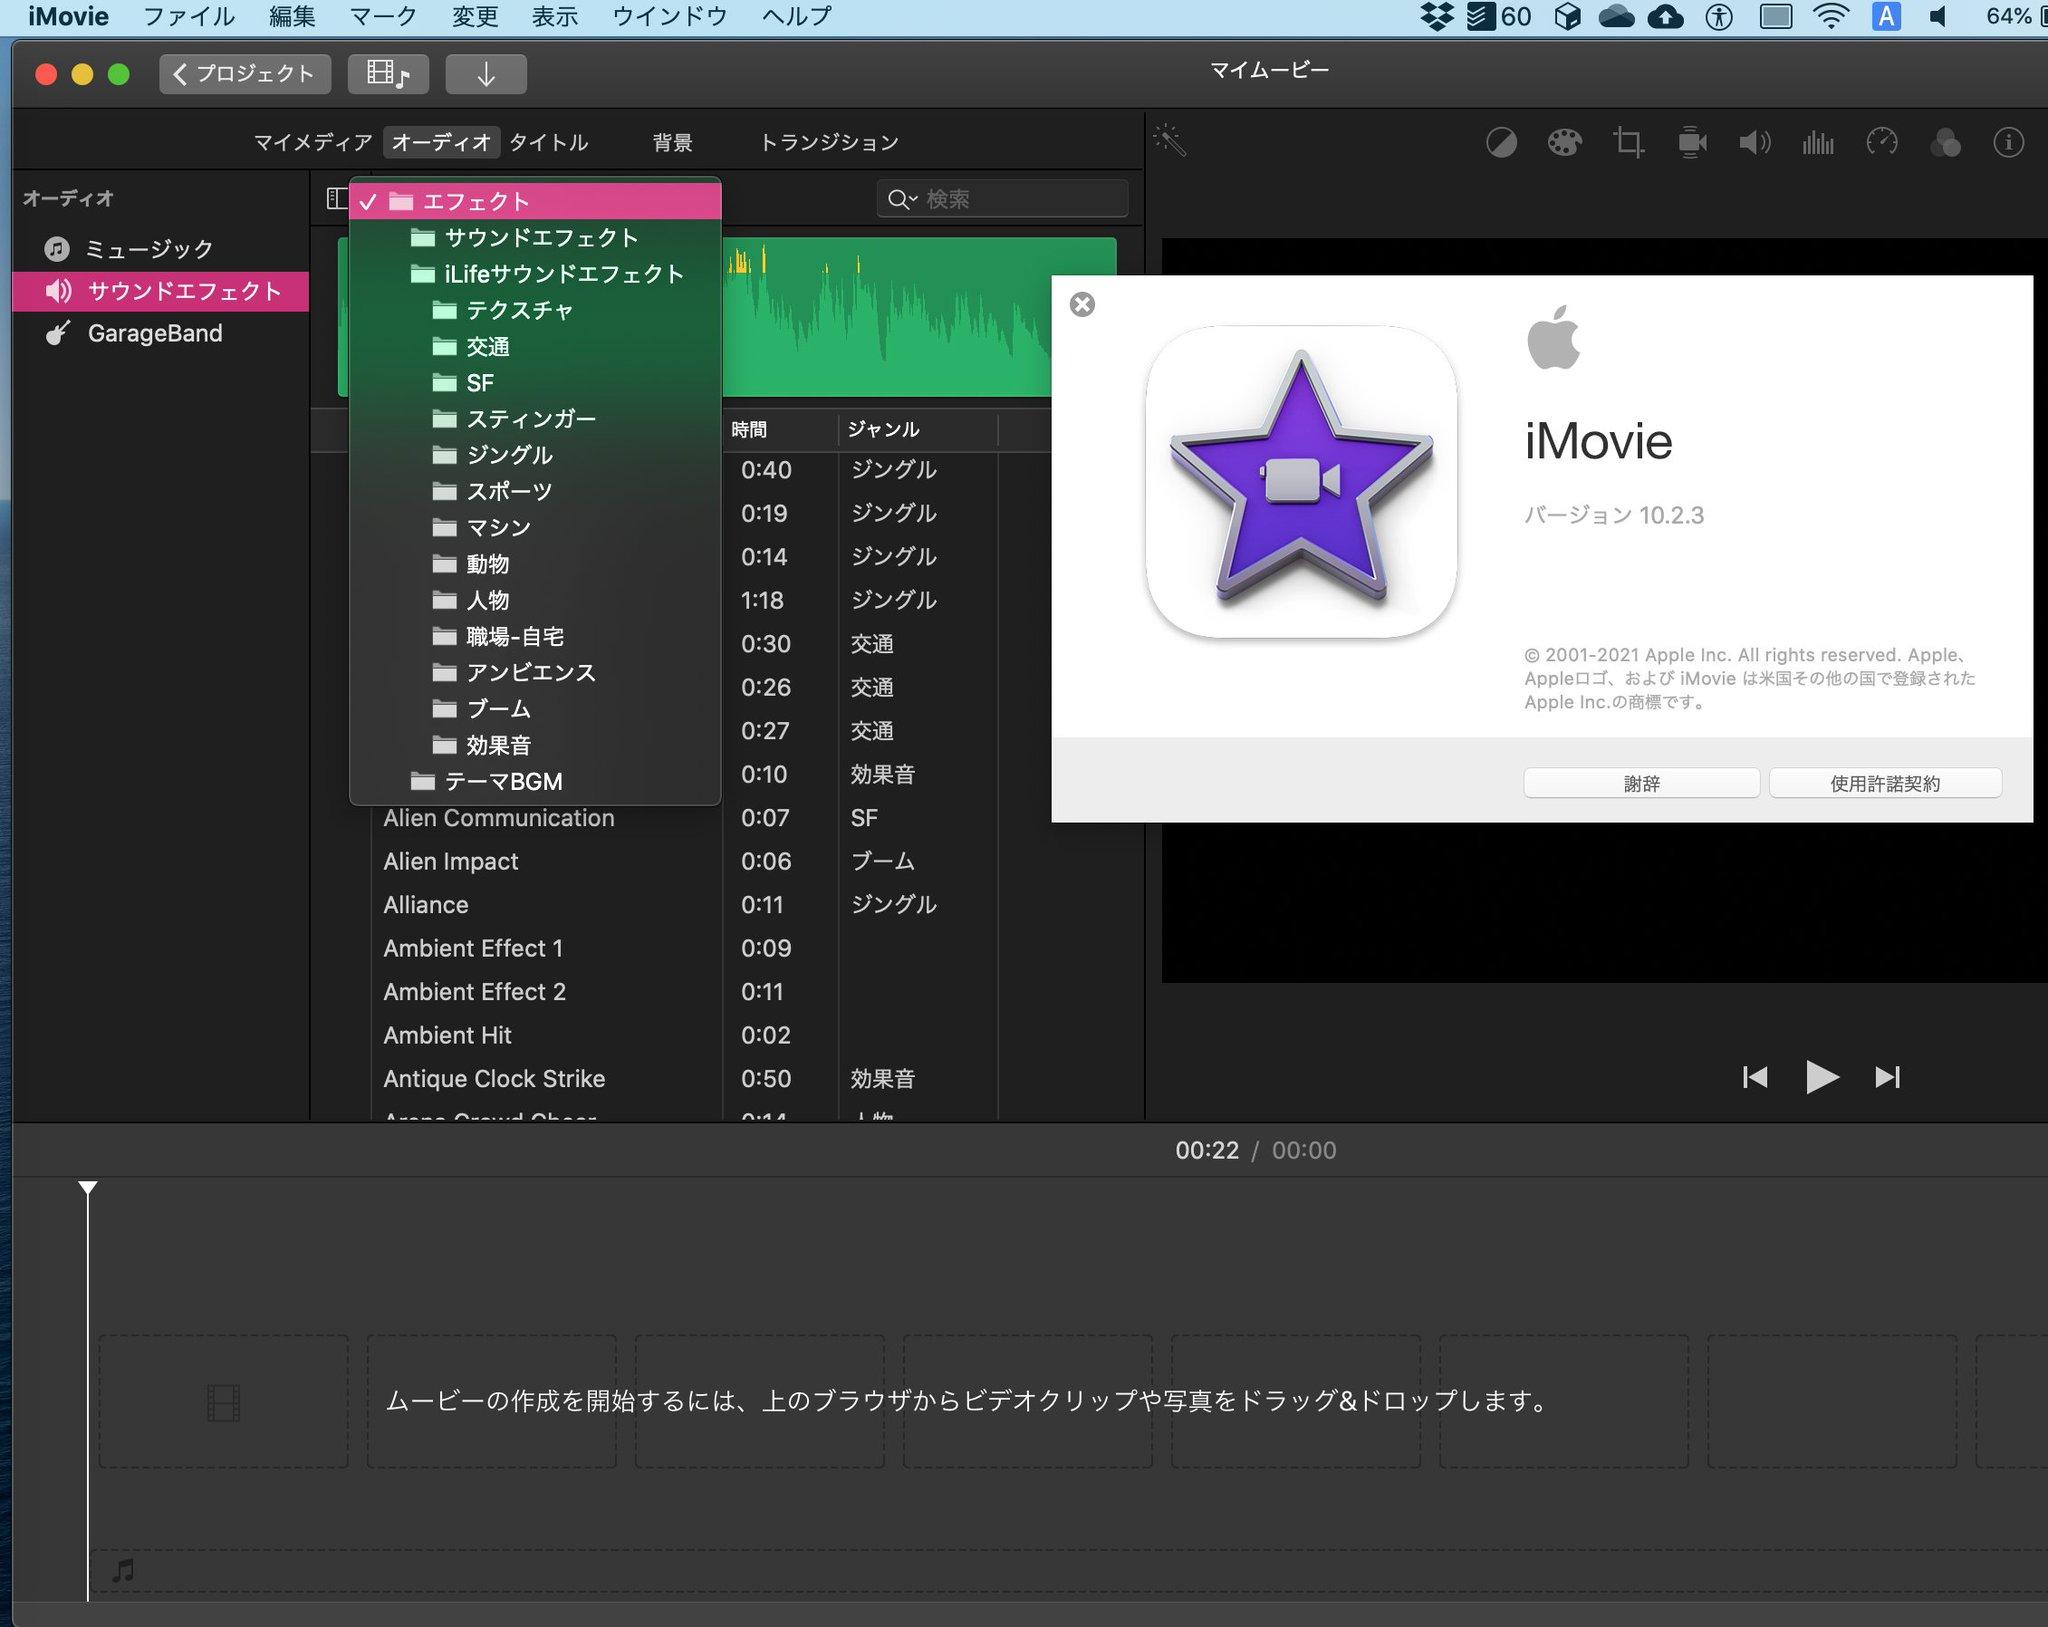 iMovie 10.2.3 (macOS Catalina) で使えるサウンドエフェクト。 https://t.co/UZRc1mIoKi